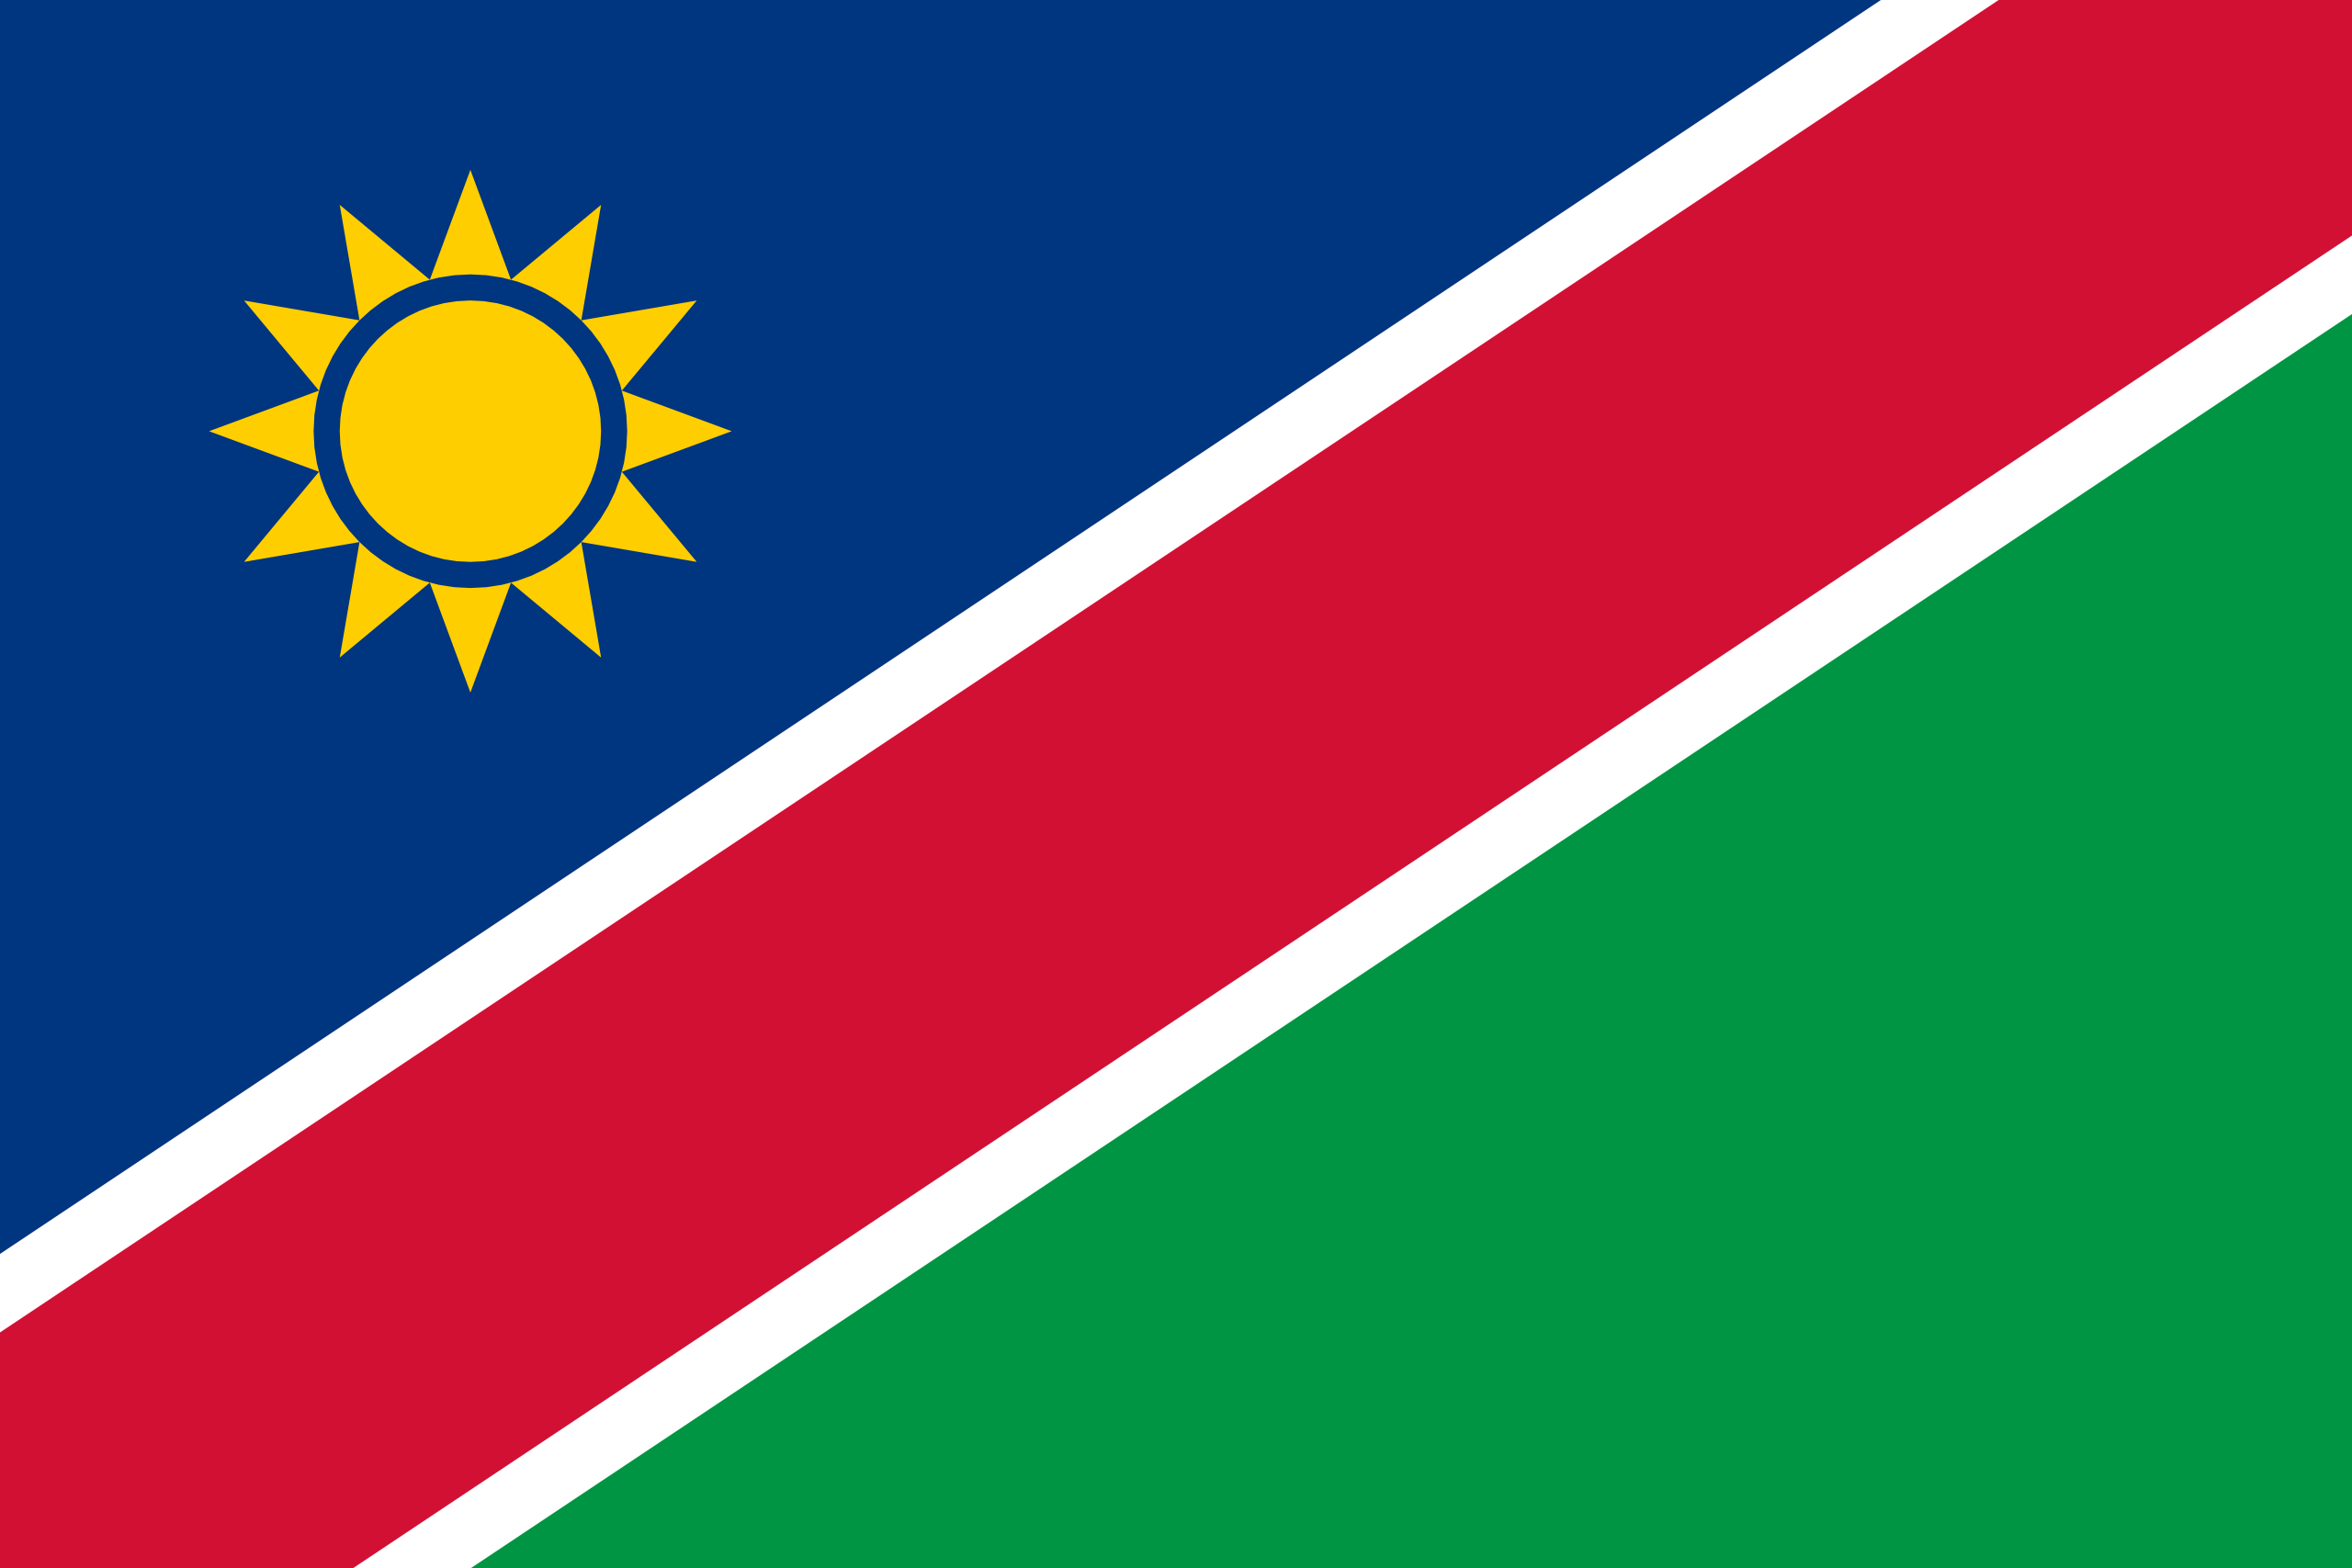 Namibia, paese, emblema, logo, simbolo - Sfondi HD - Professor-falken.com